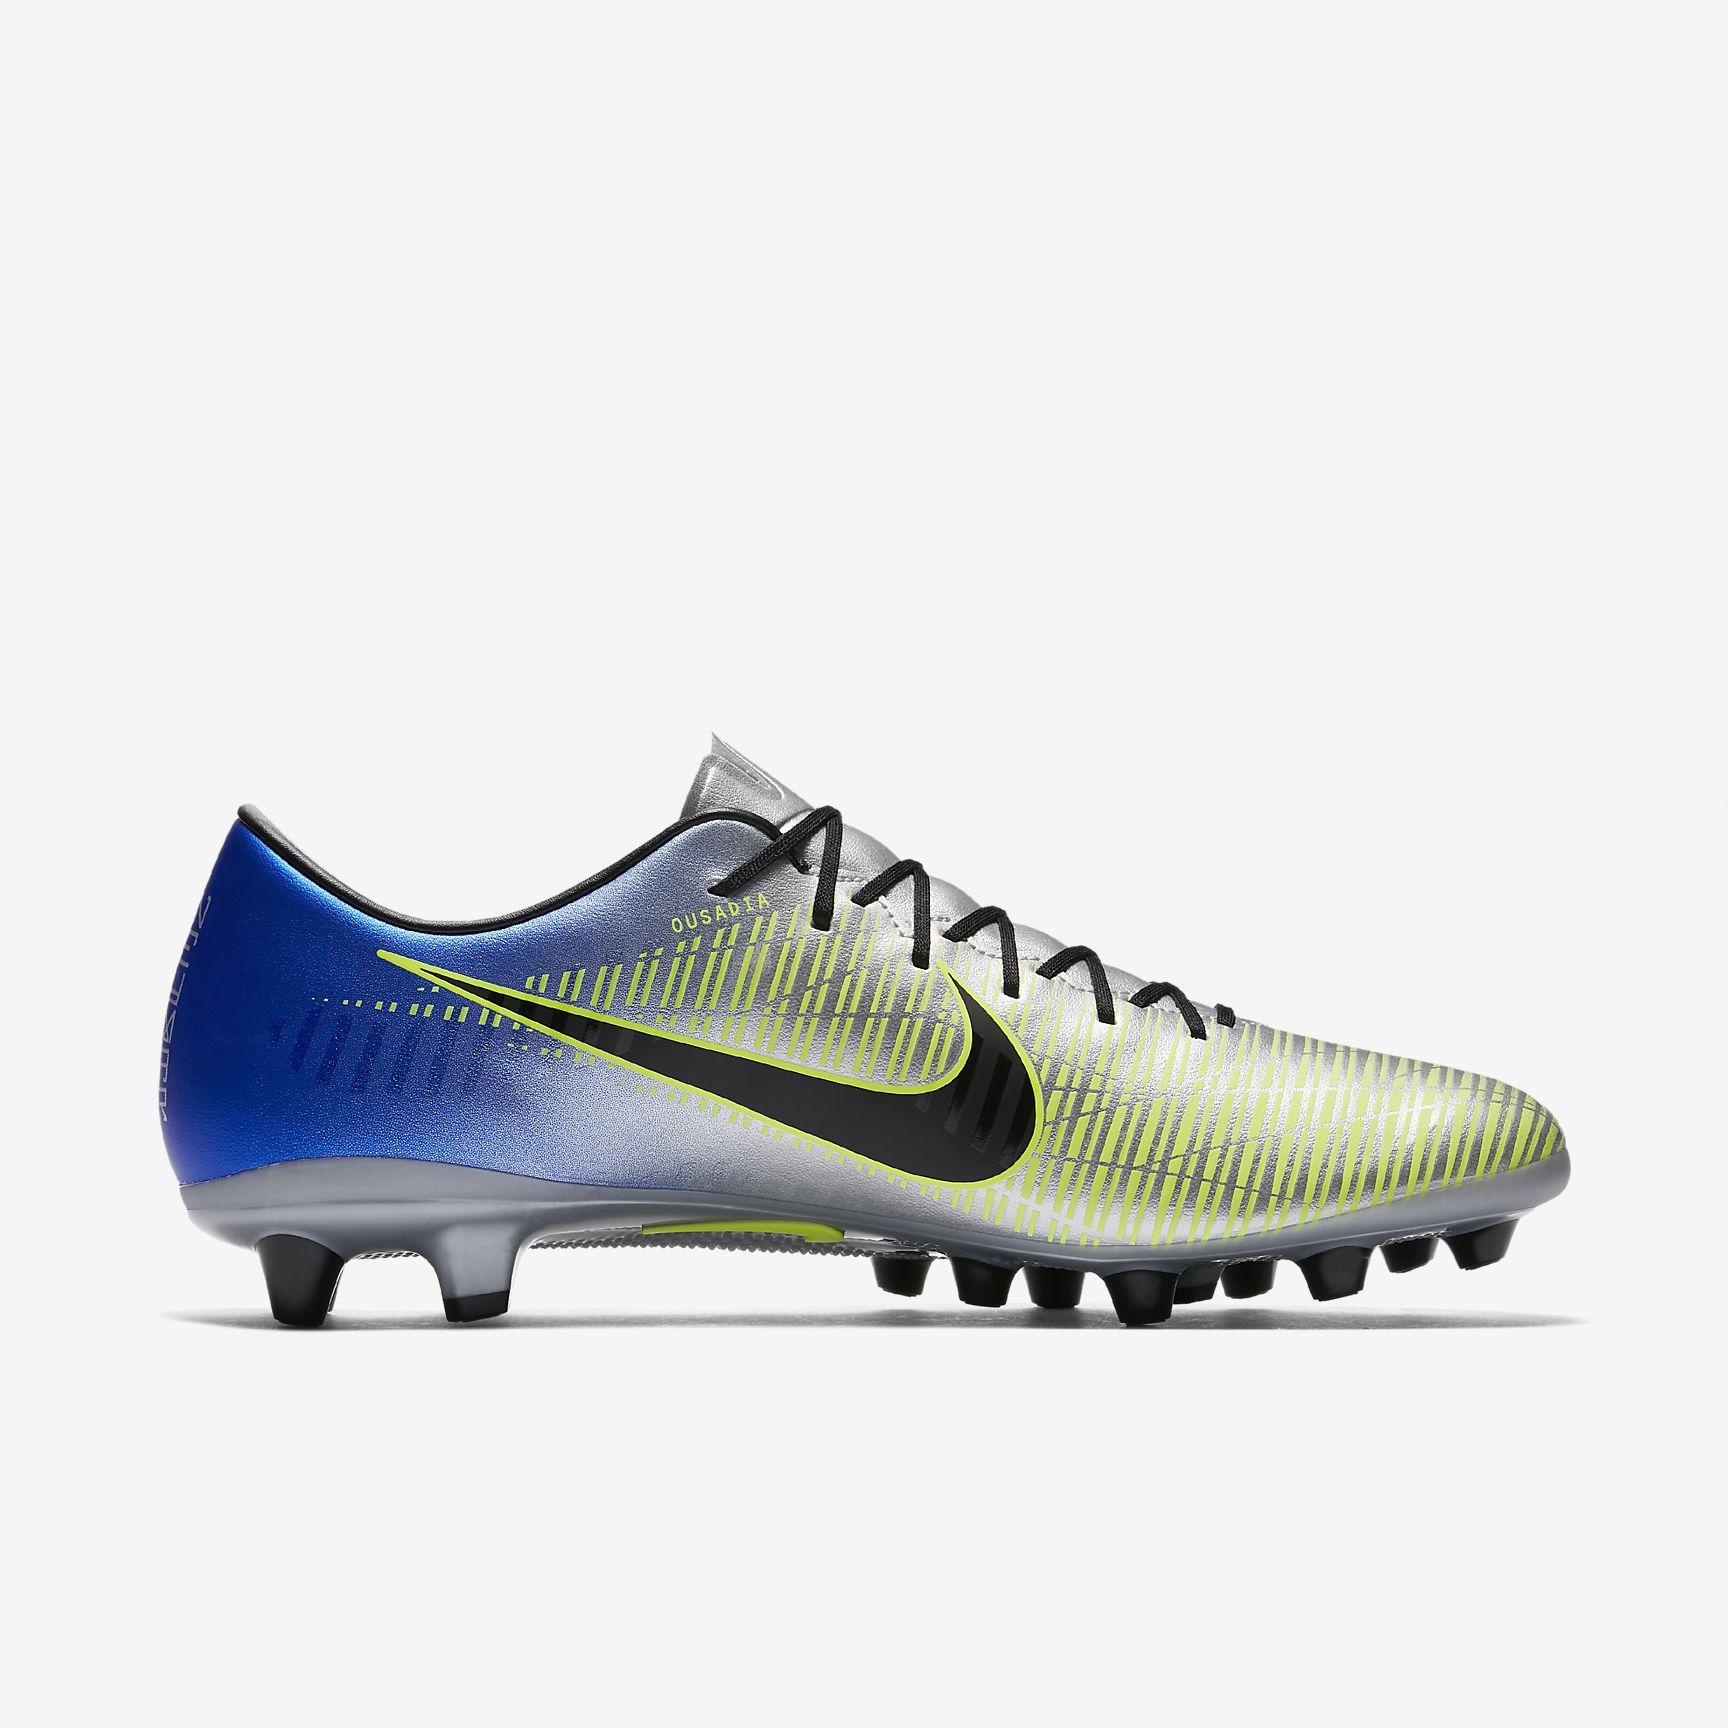 scarpe da calcio nike 2018 mercurial